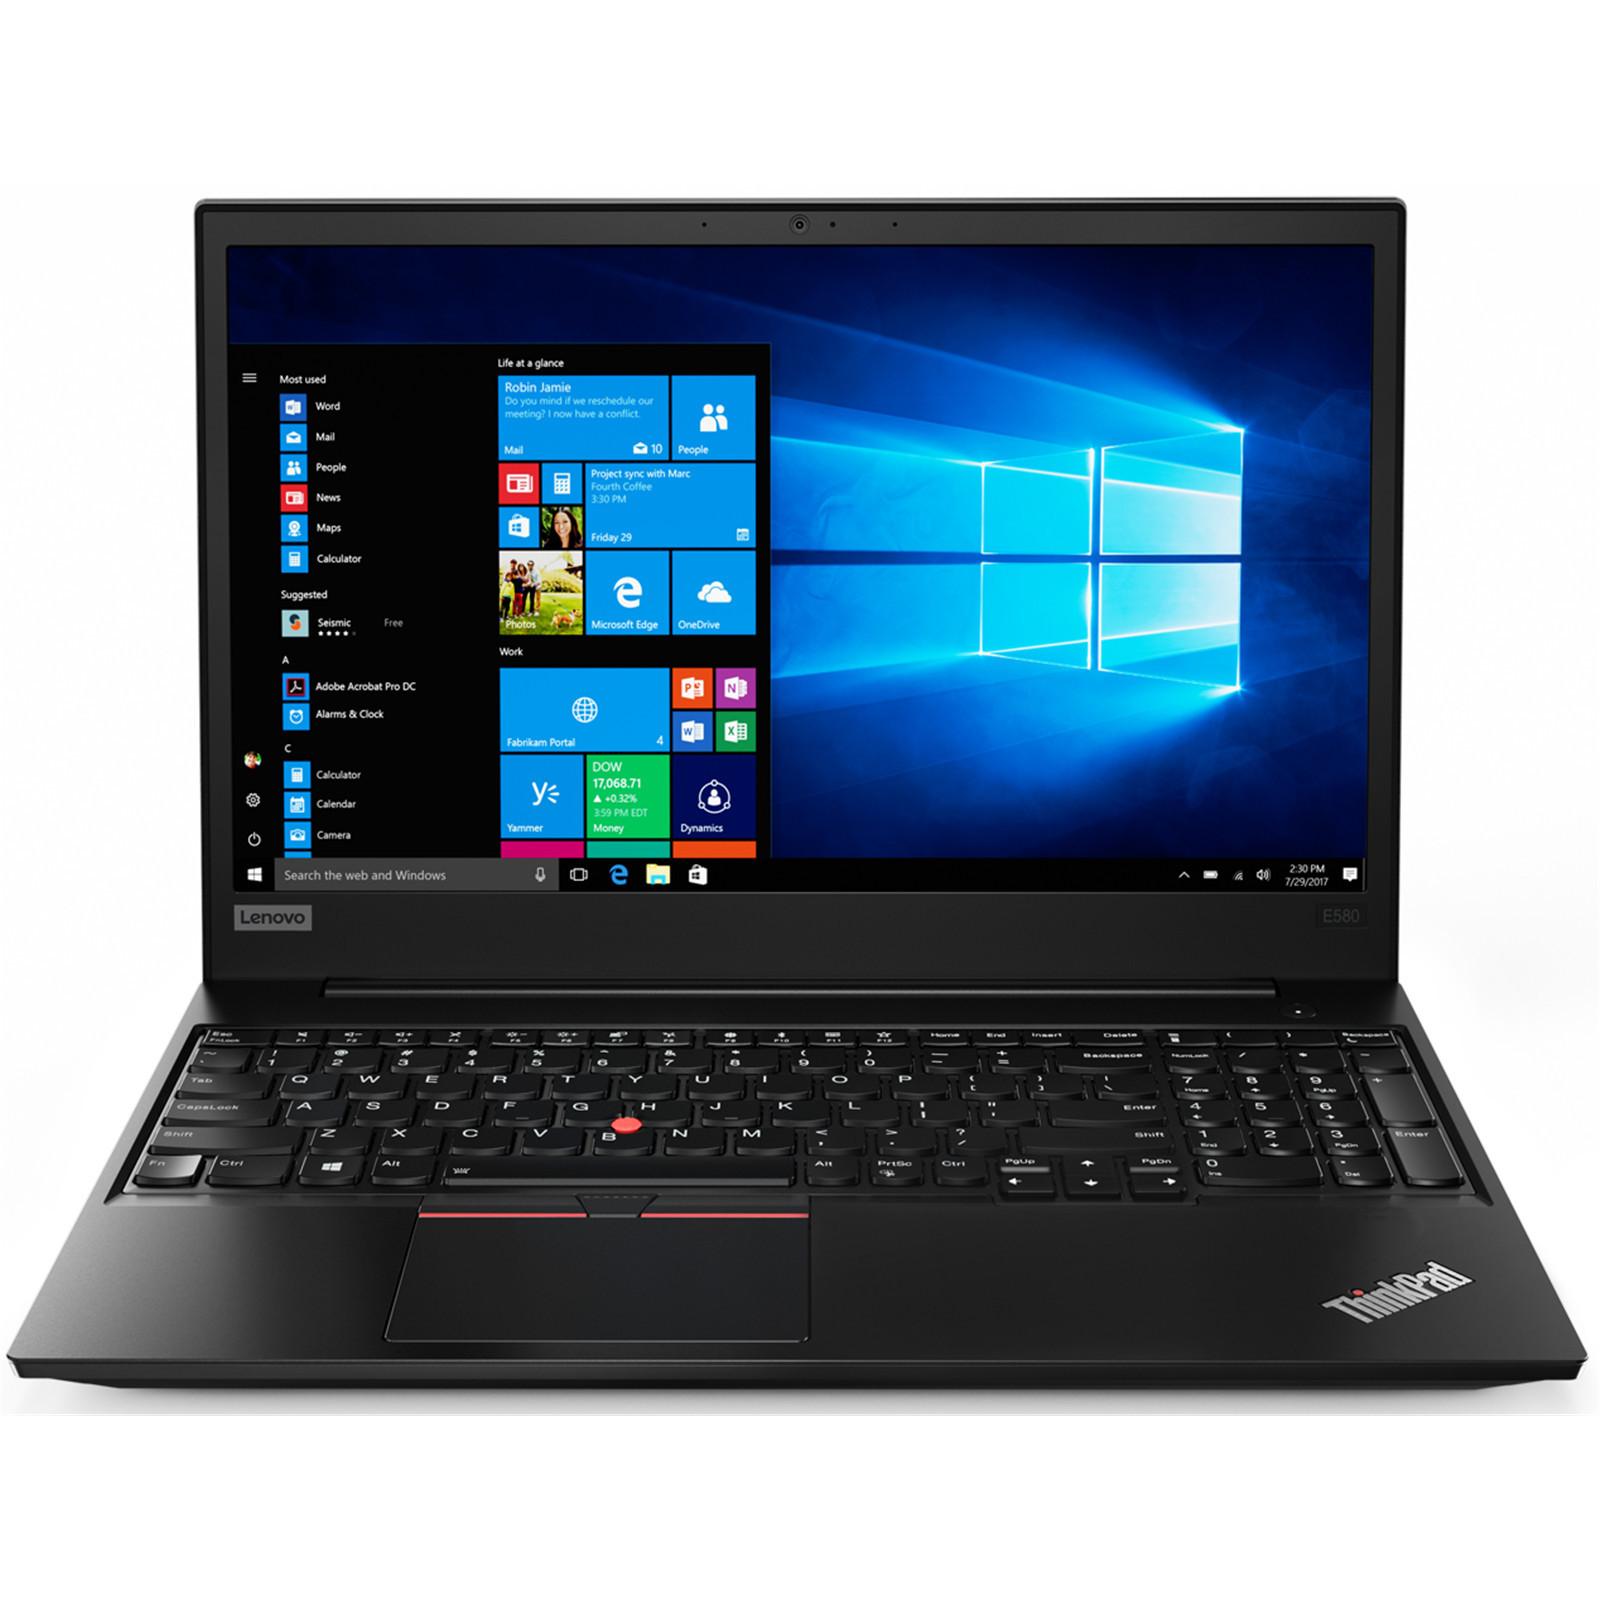 66258b29f1bb Buy the Lenovo Thinkpad E580 Business Notebook 15.6